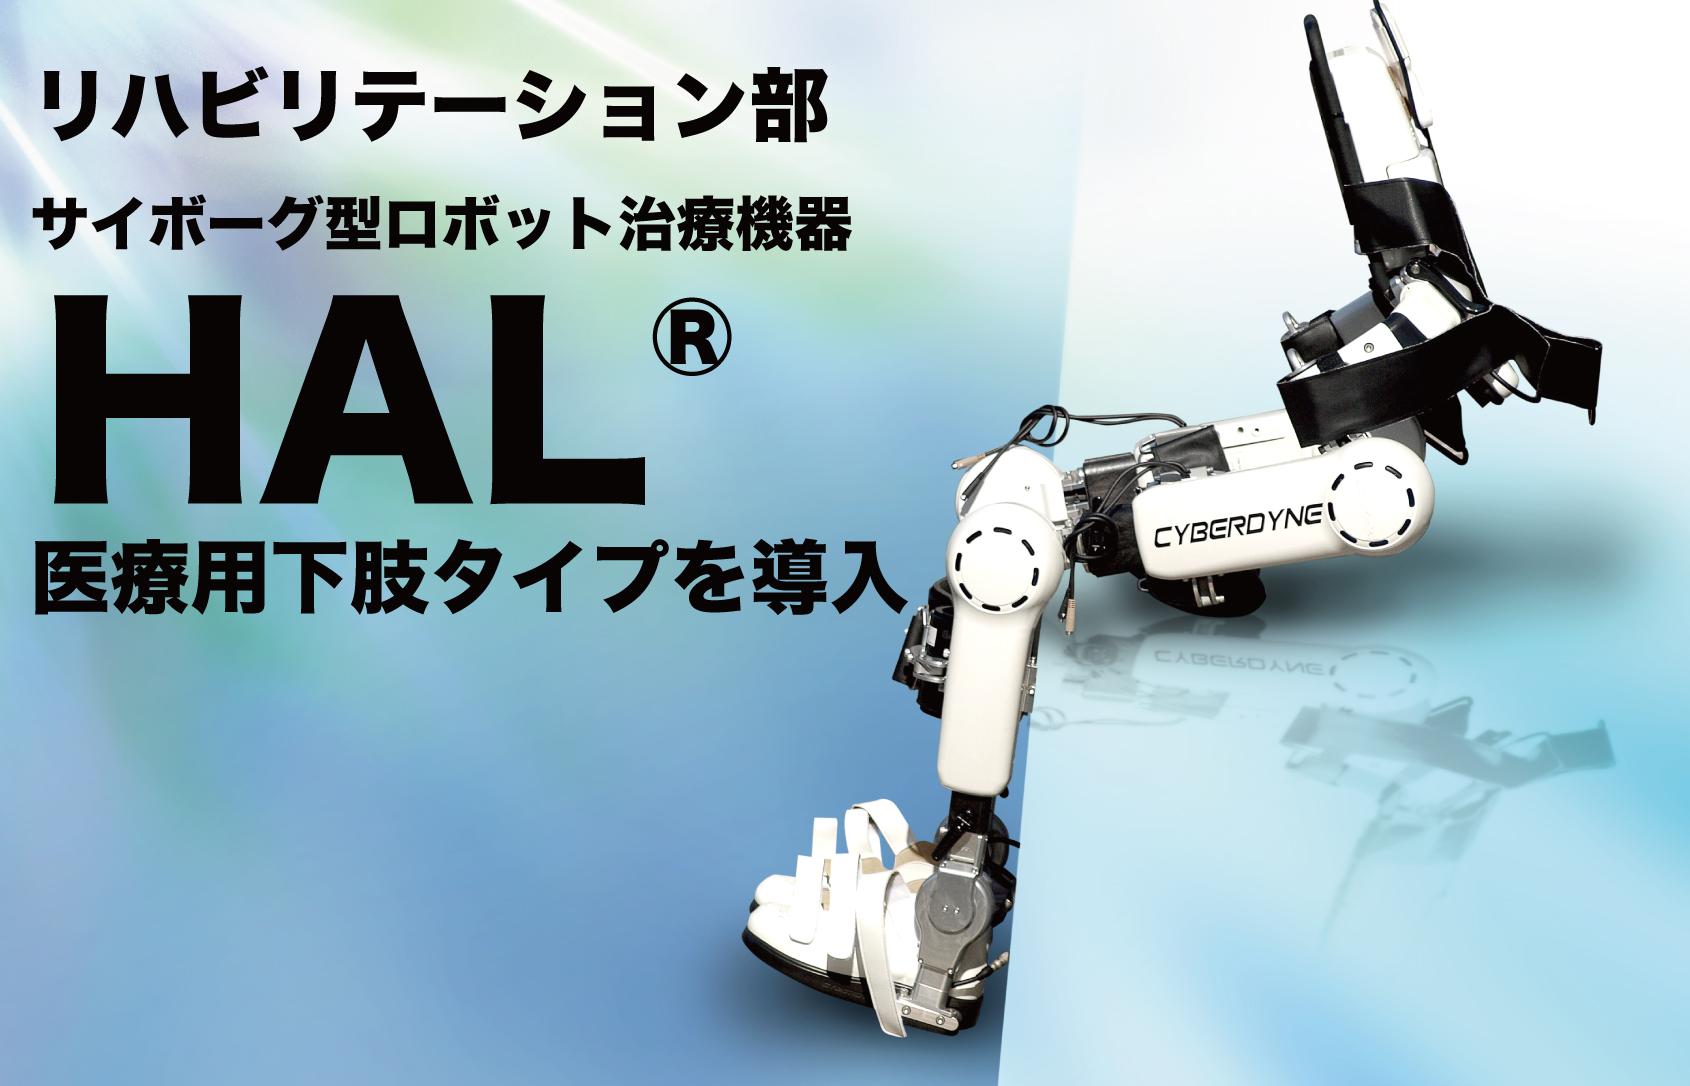 AGMCリハビリテーション部:ロボットスーツHAL®(Hybrid Assistive Limb®)医療用下肢タイプの導入